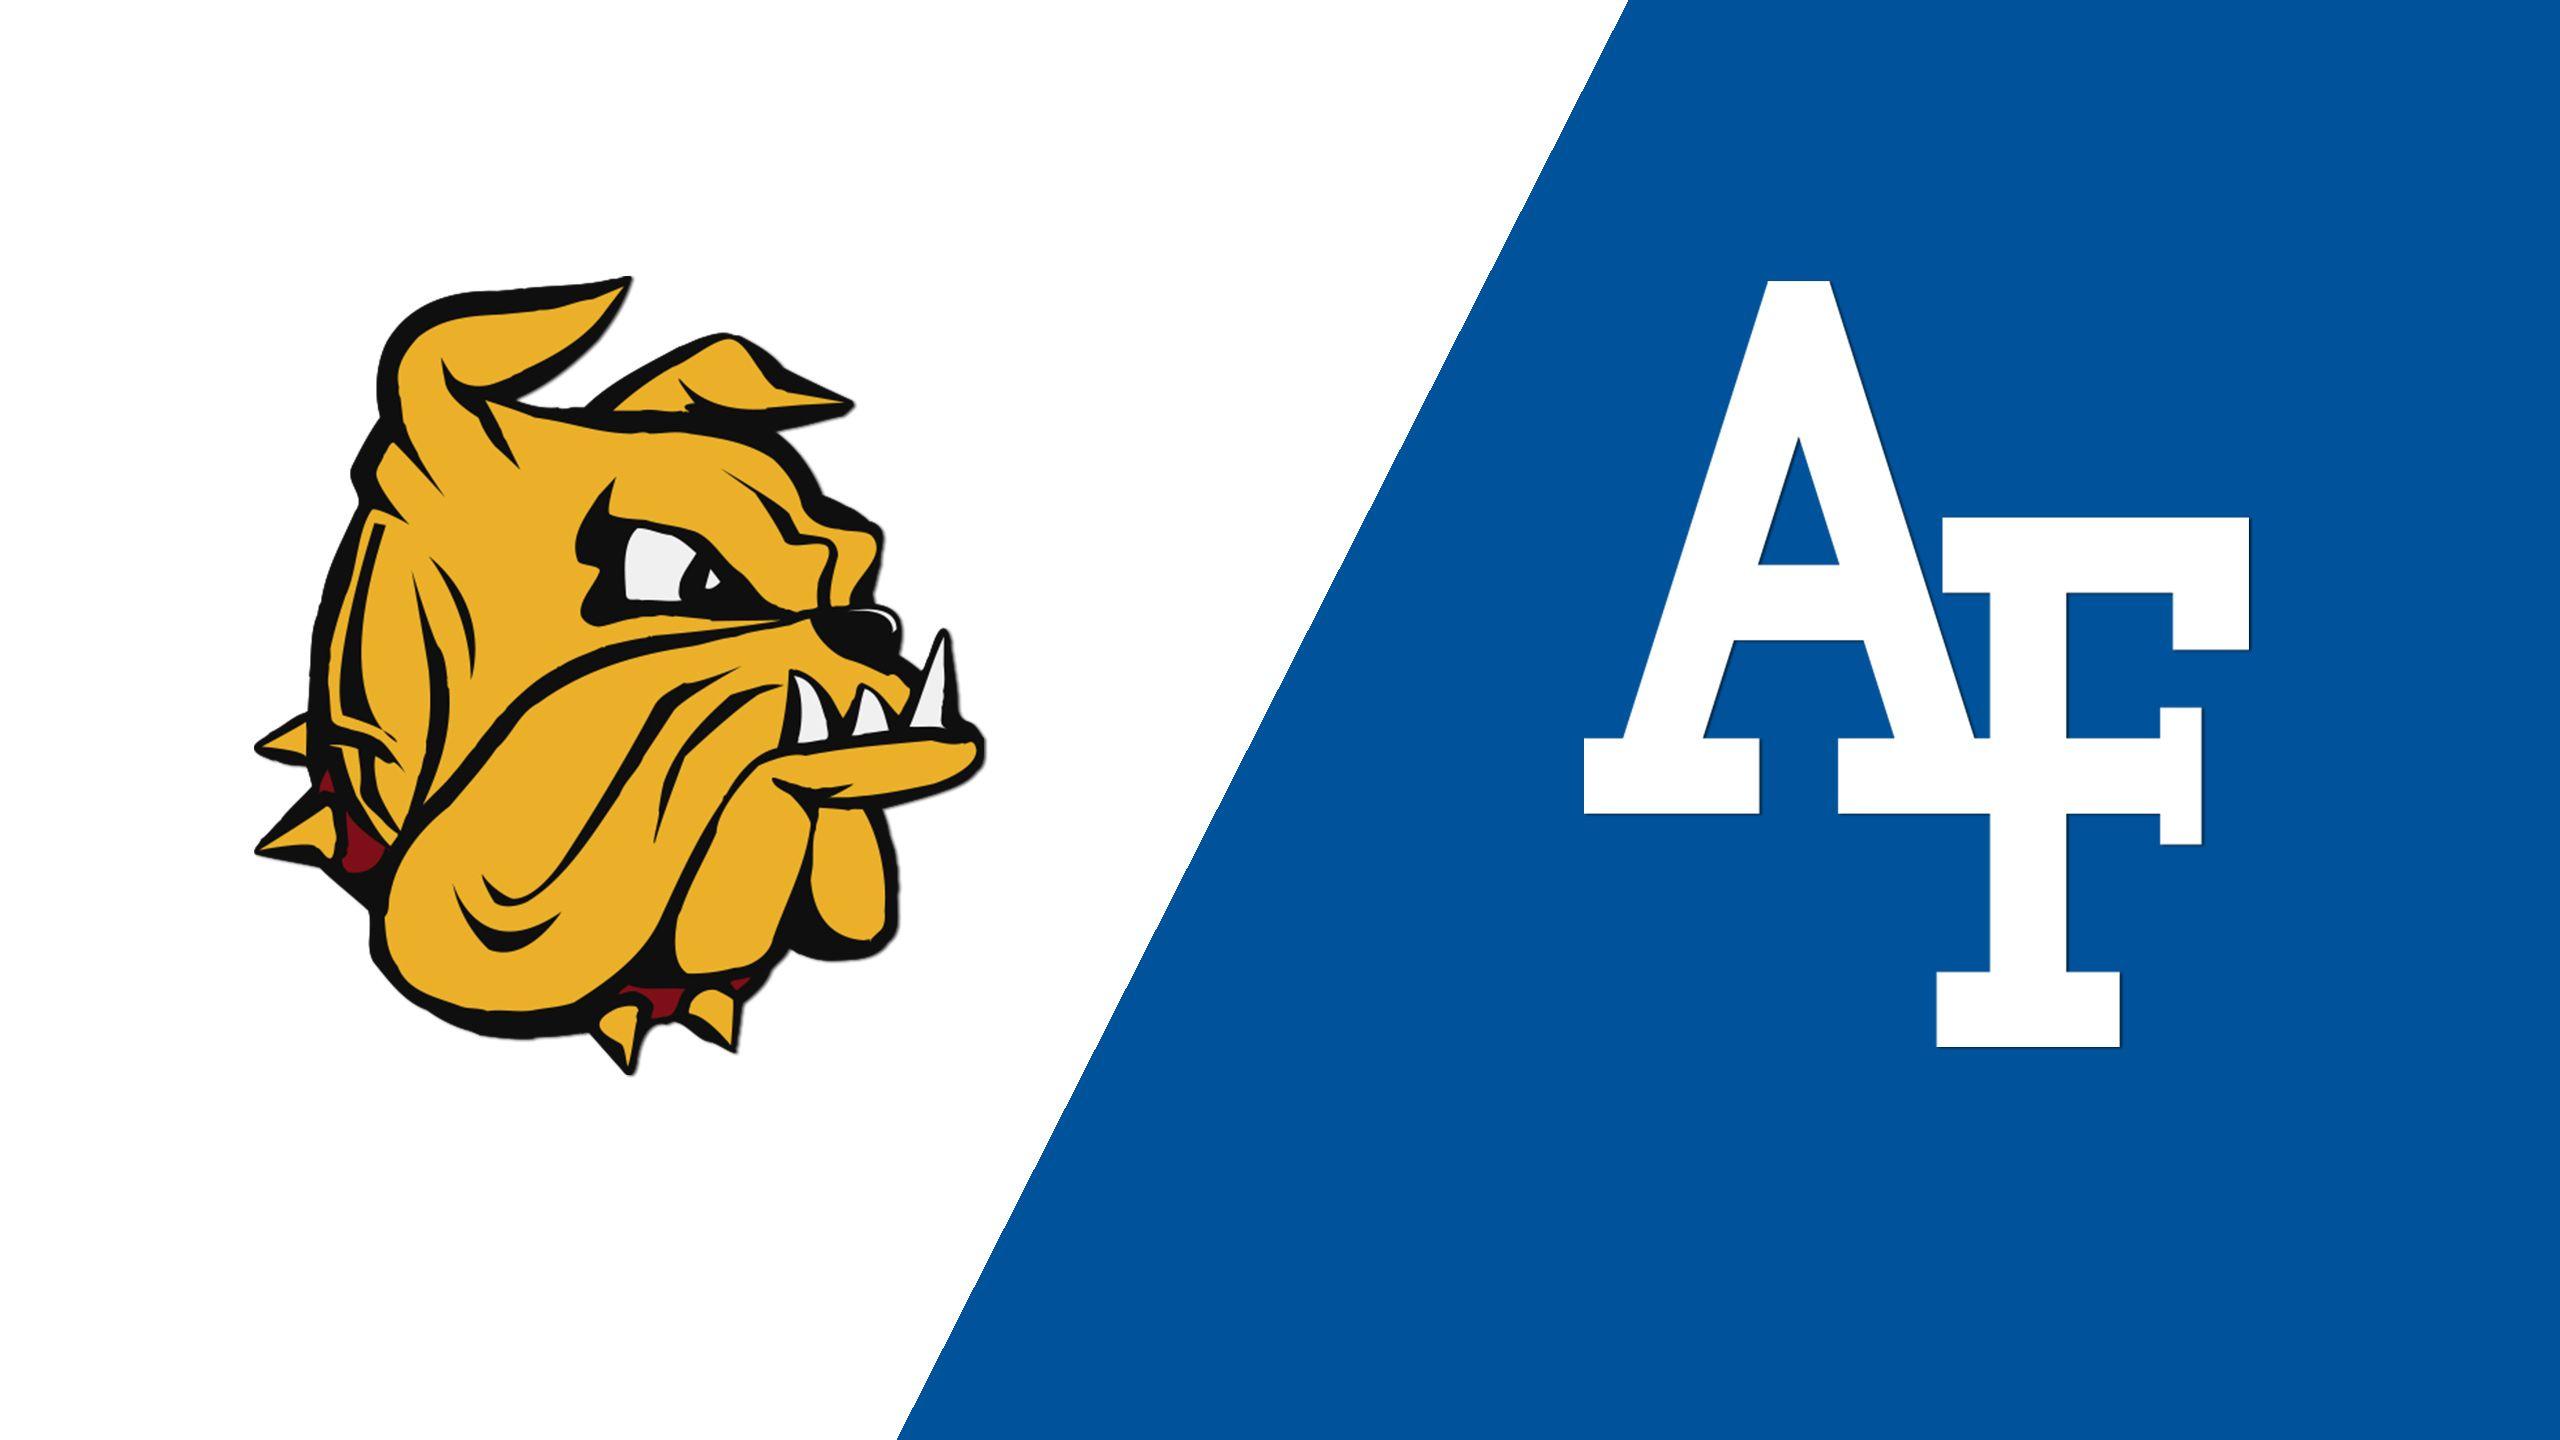 #4 Air Force vs. #3 Minnesota Duluth (West Regional Final) (NCAA Men's Hockey Championship)